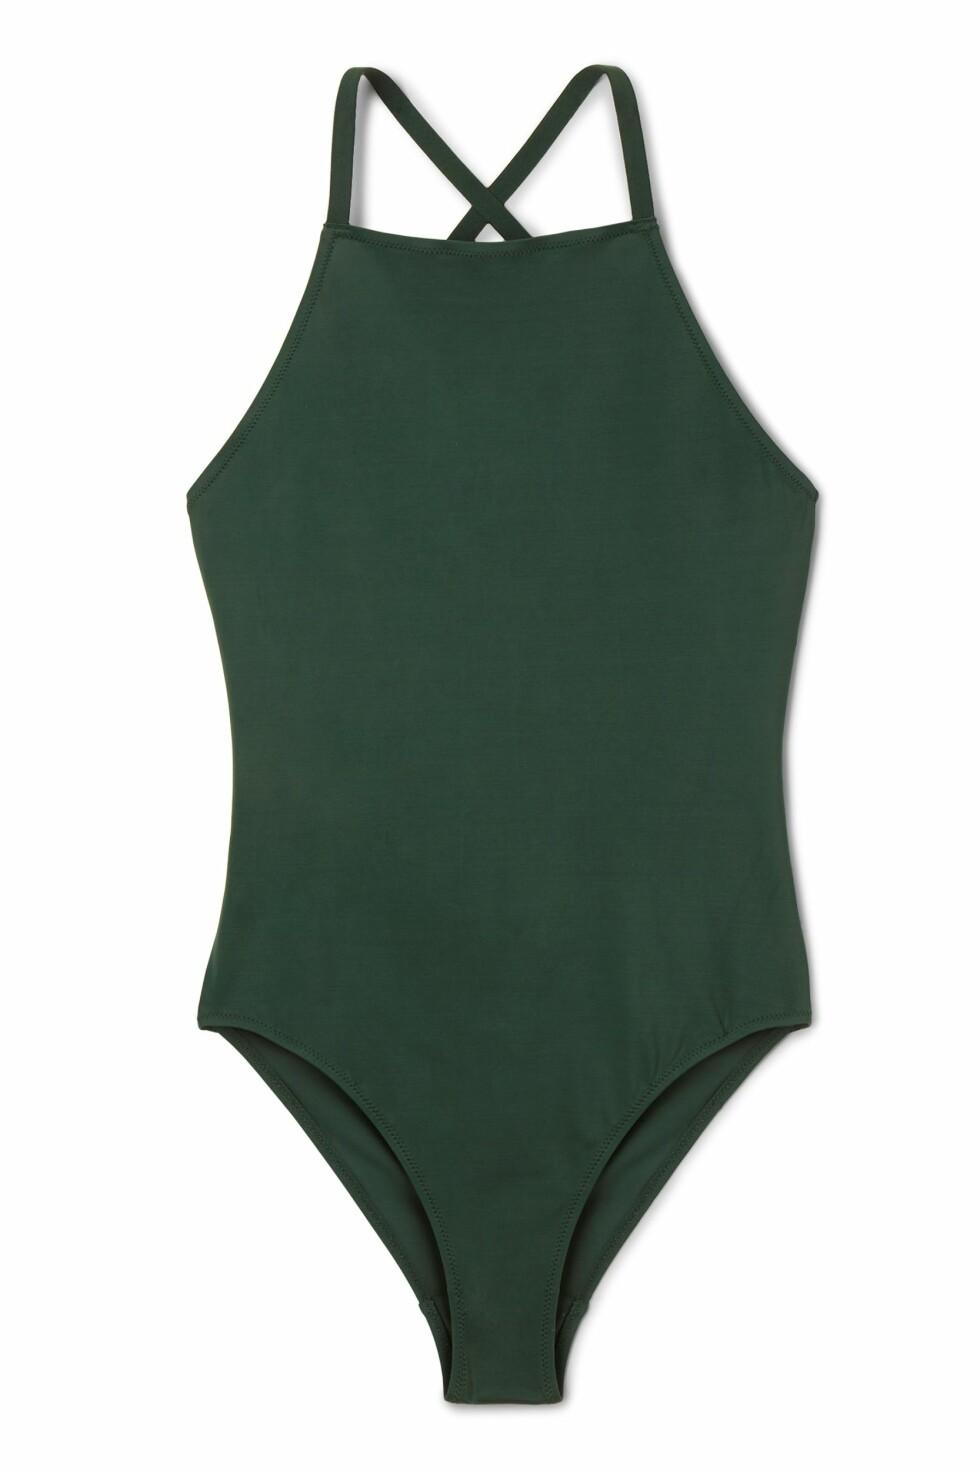 Badedrakt fra Weekday | kr 250 | http://shop.weekday.com/gb/Womens_shop/Swimwear/All/Atlantis_Swimsuit/8278058-11115600.1#c-47958#Rel?PC=